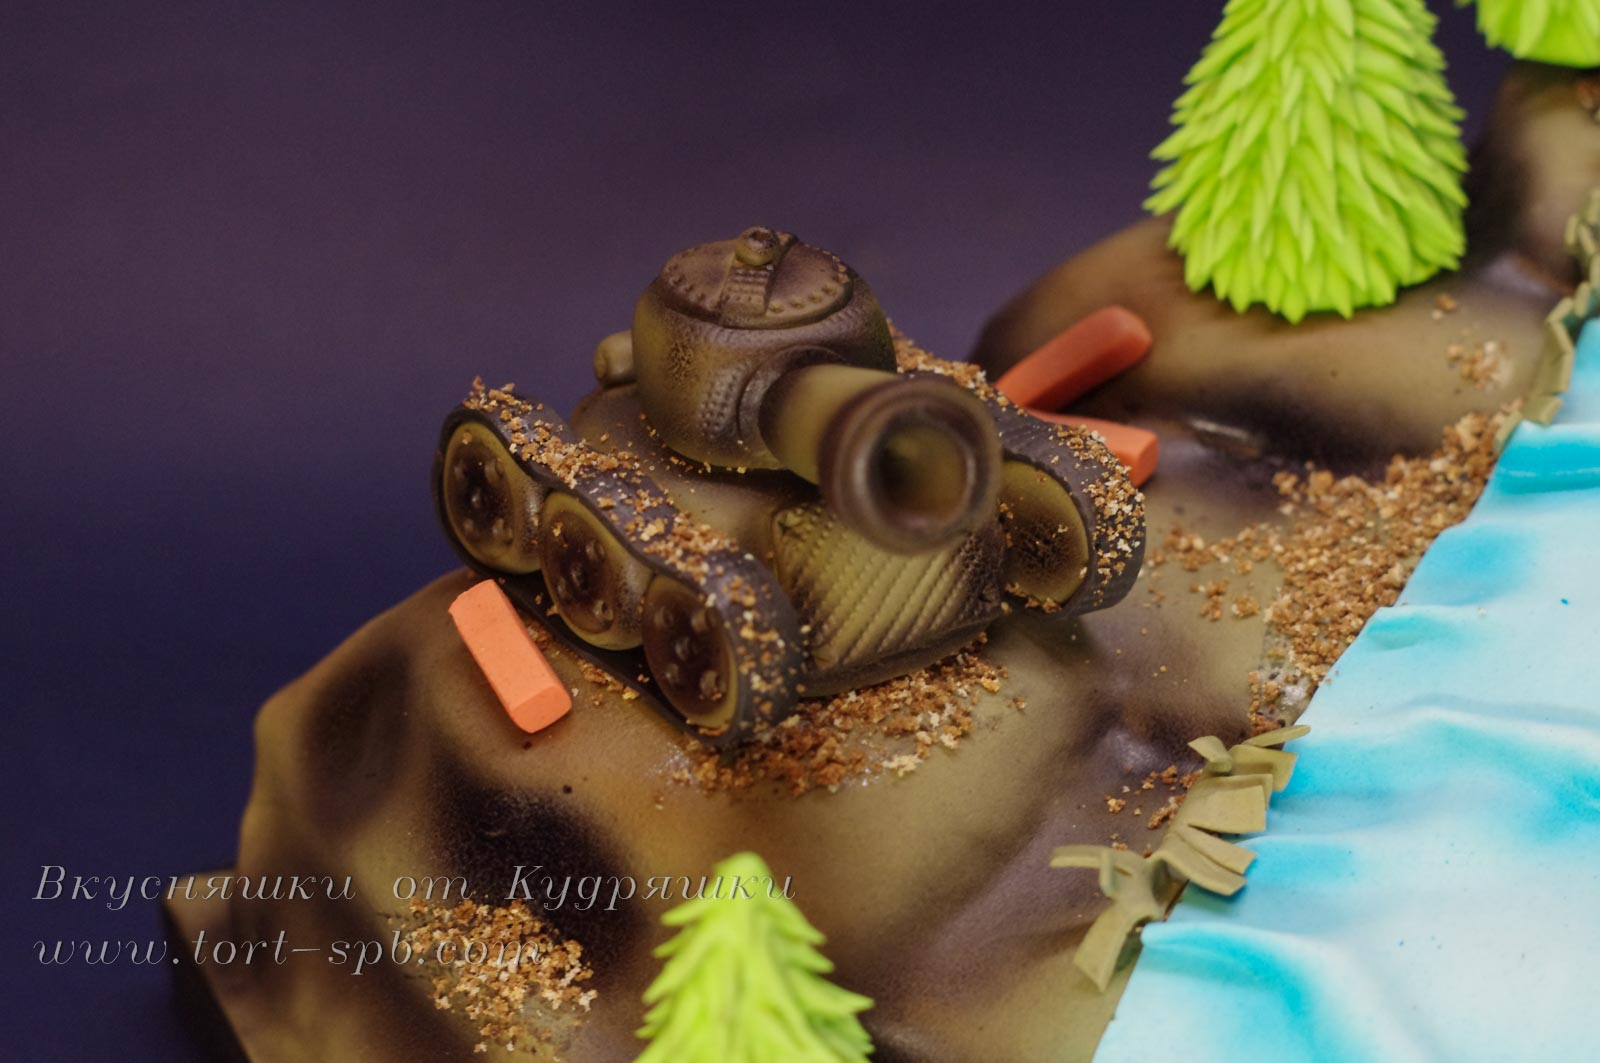 Торт к Дню защитника отечества